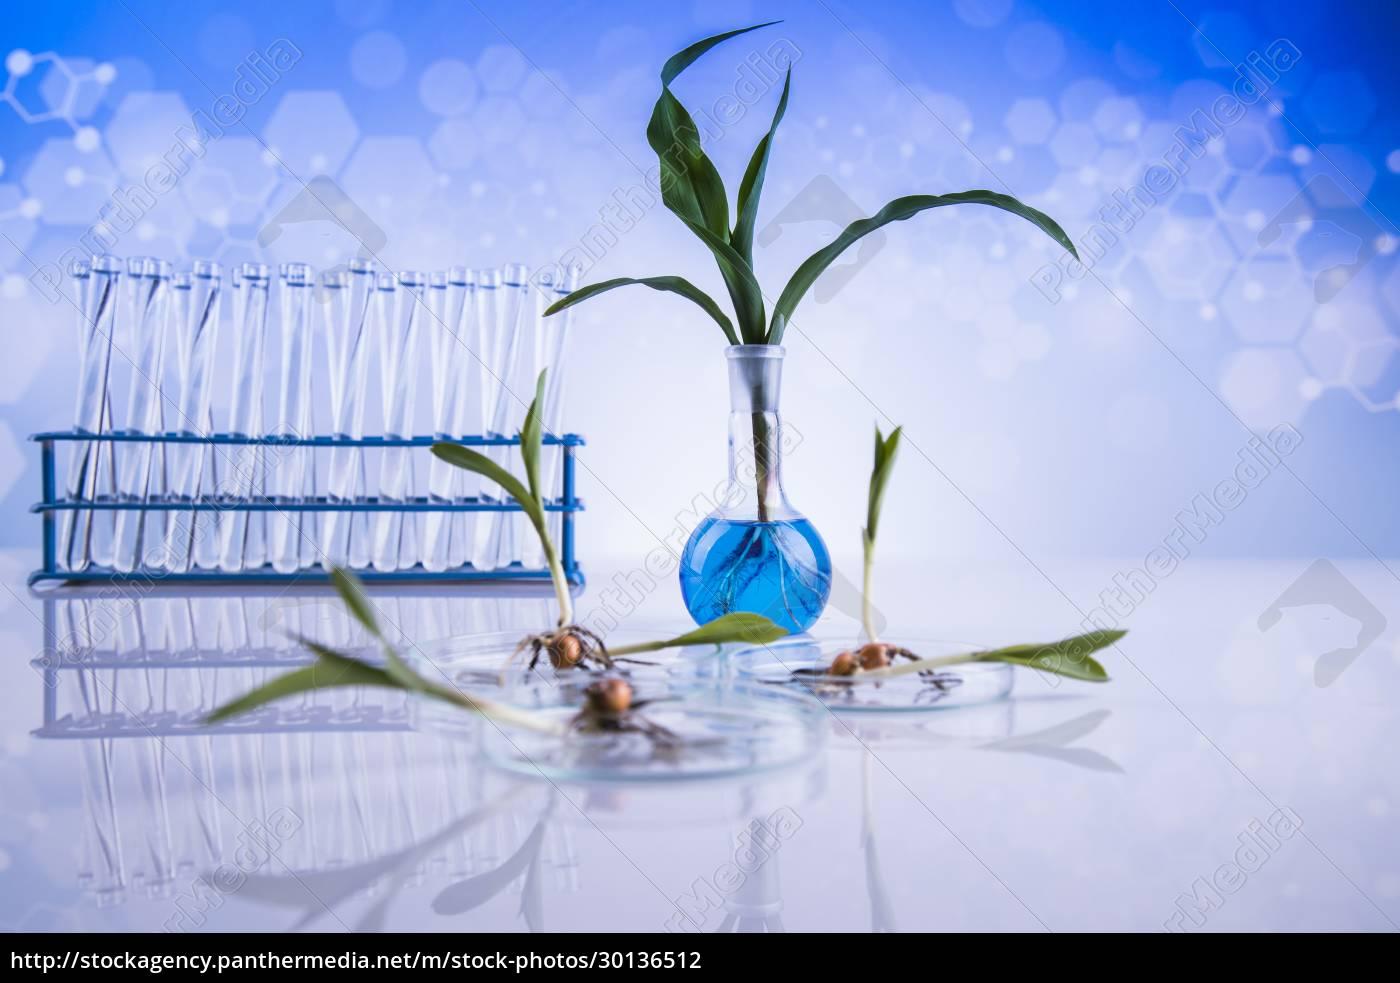 chemistry, equipment, , plants, laboratory, experimental - 30136512